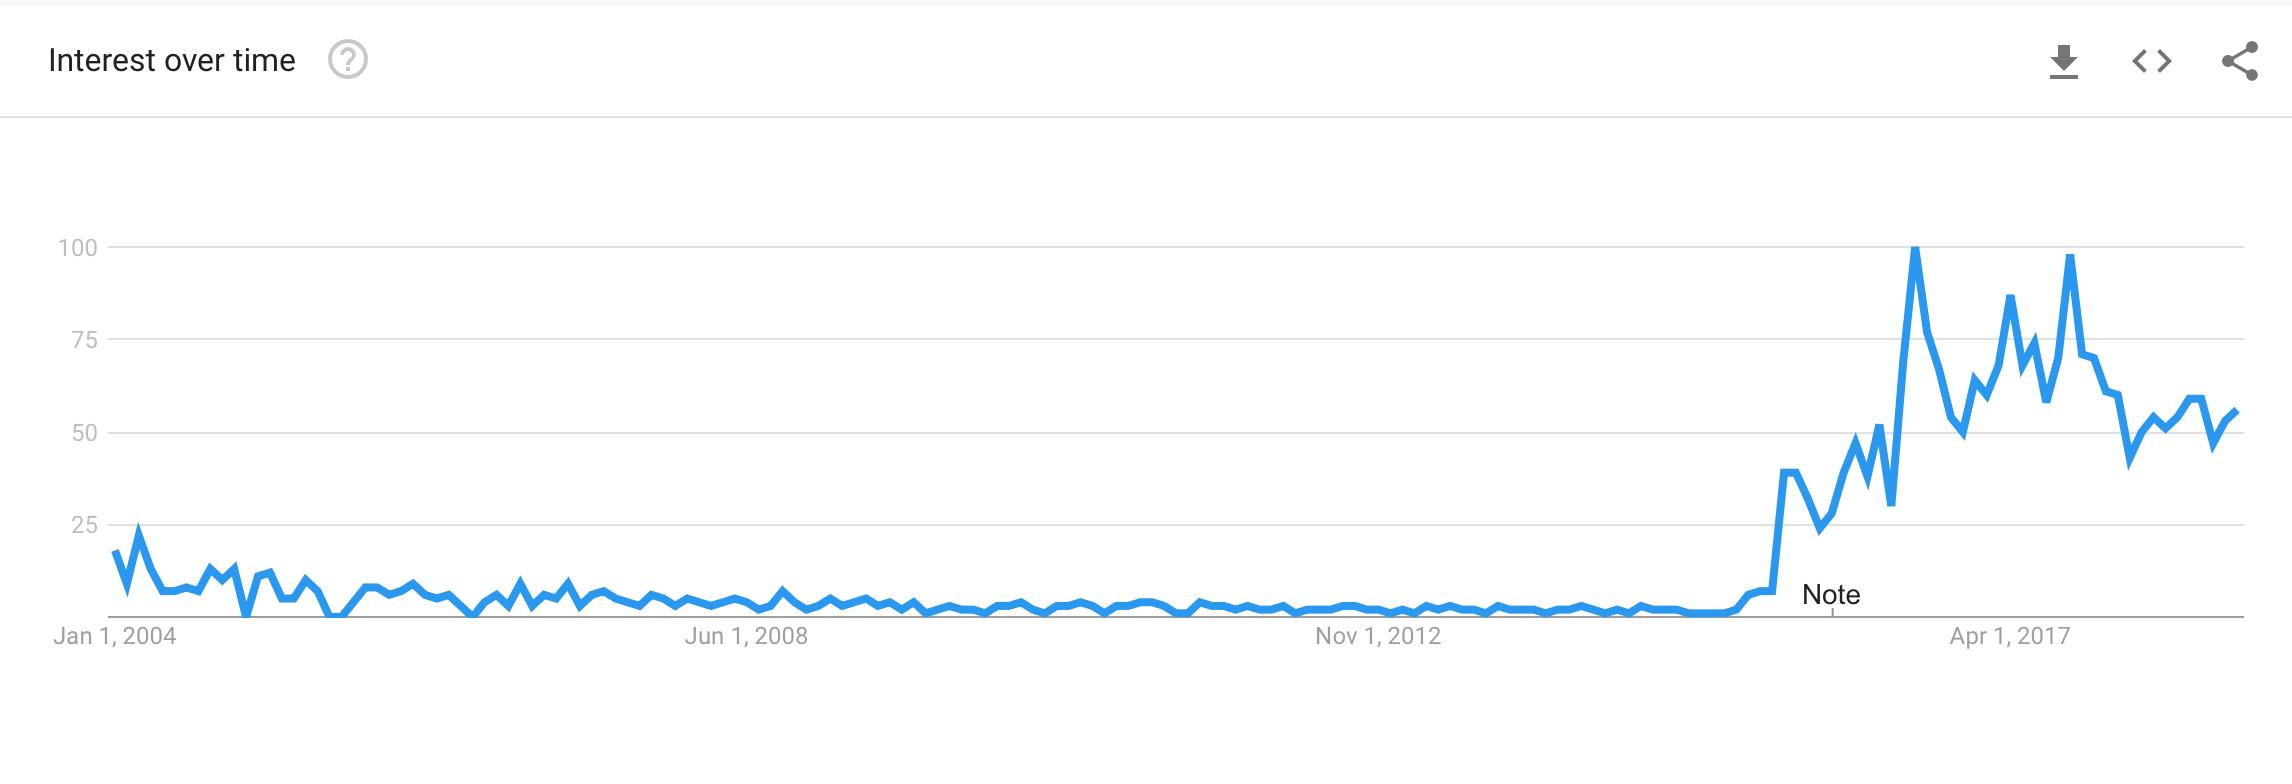 Data source: Google Trends